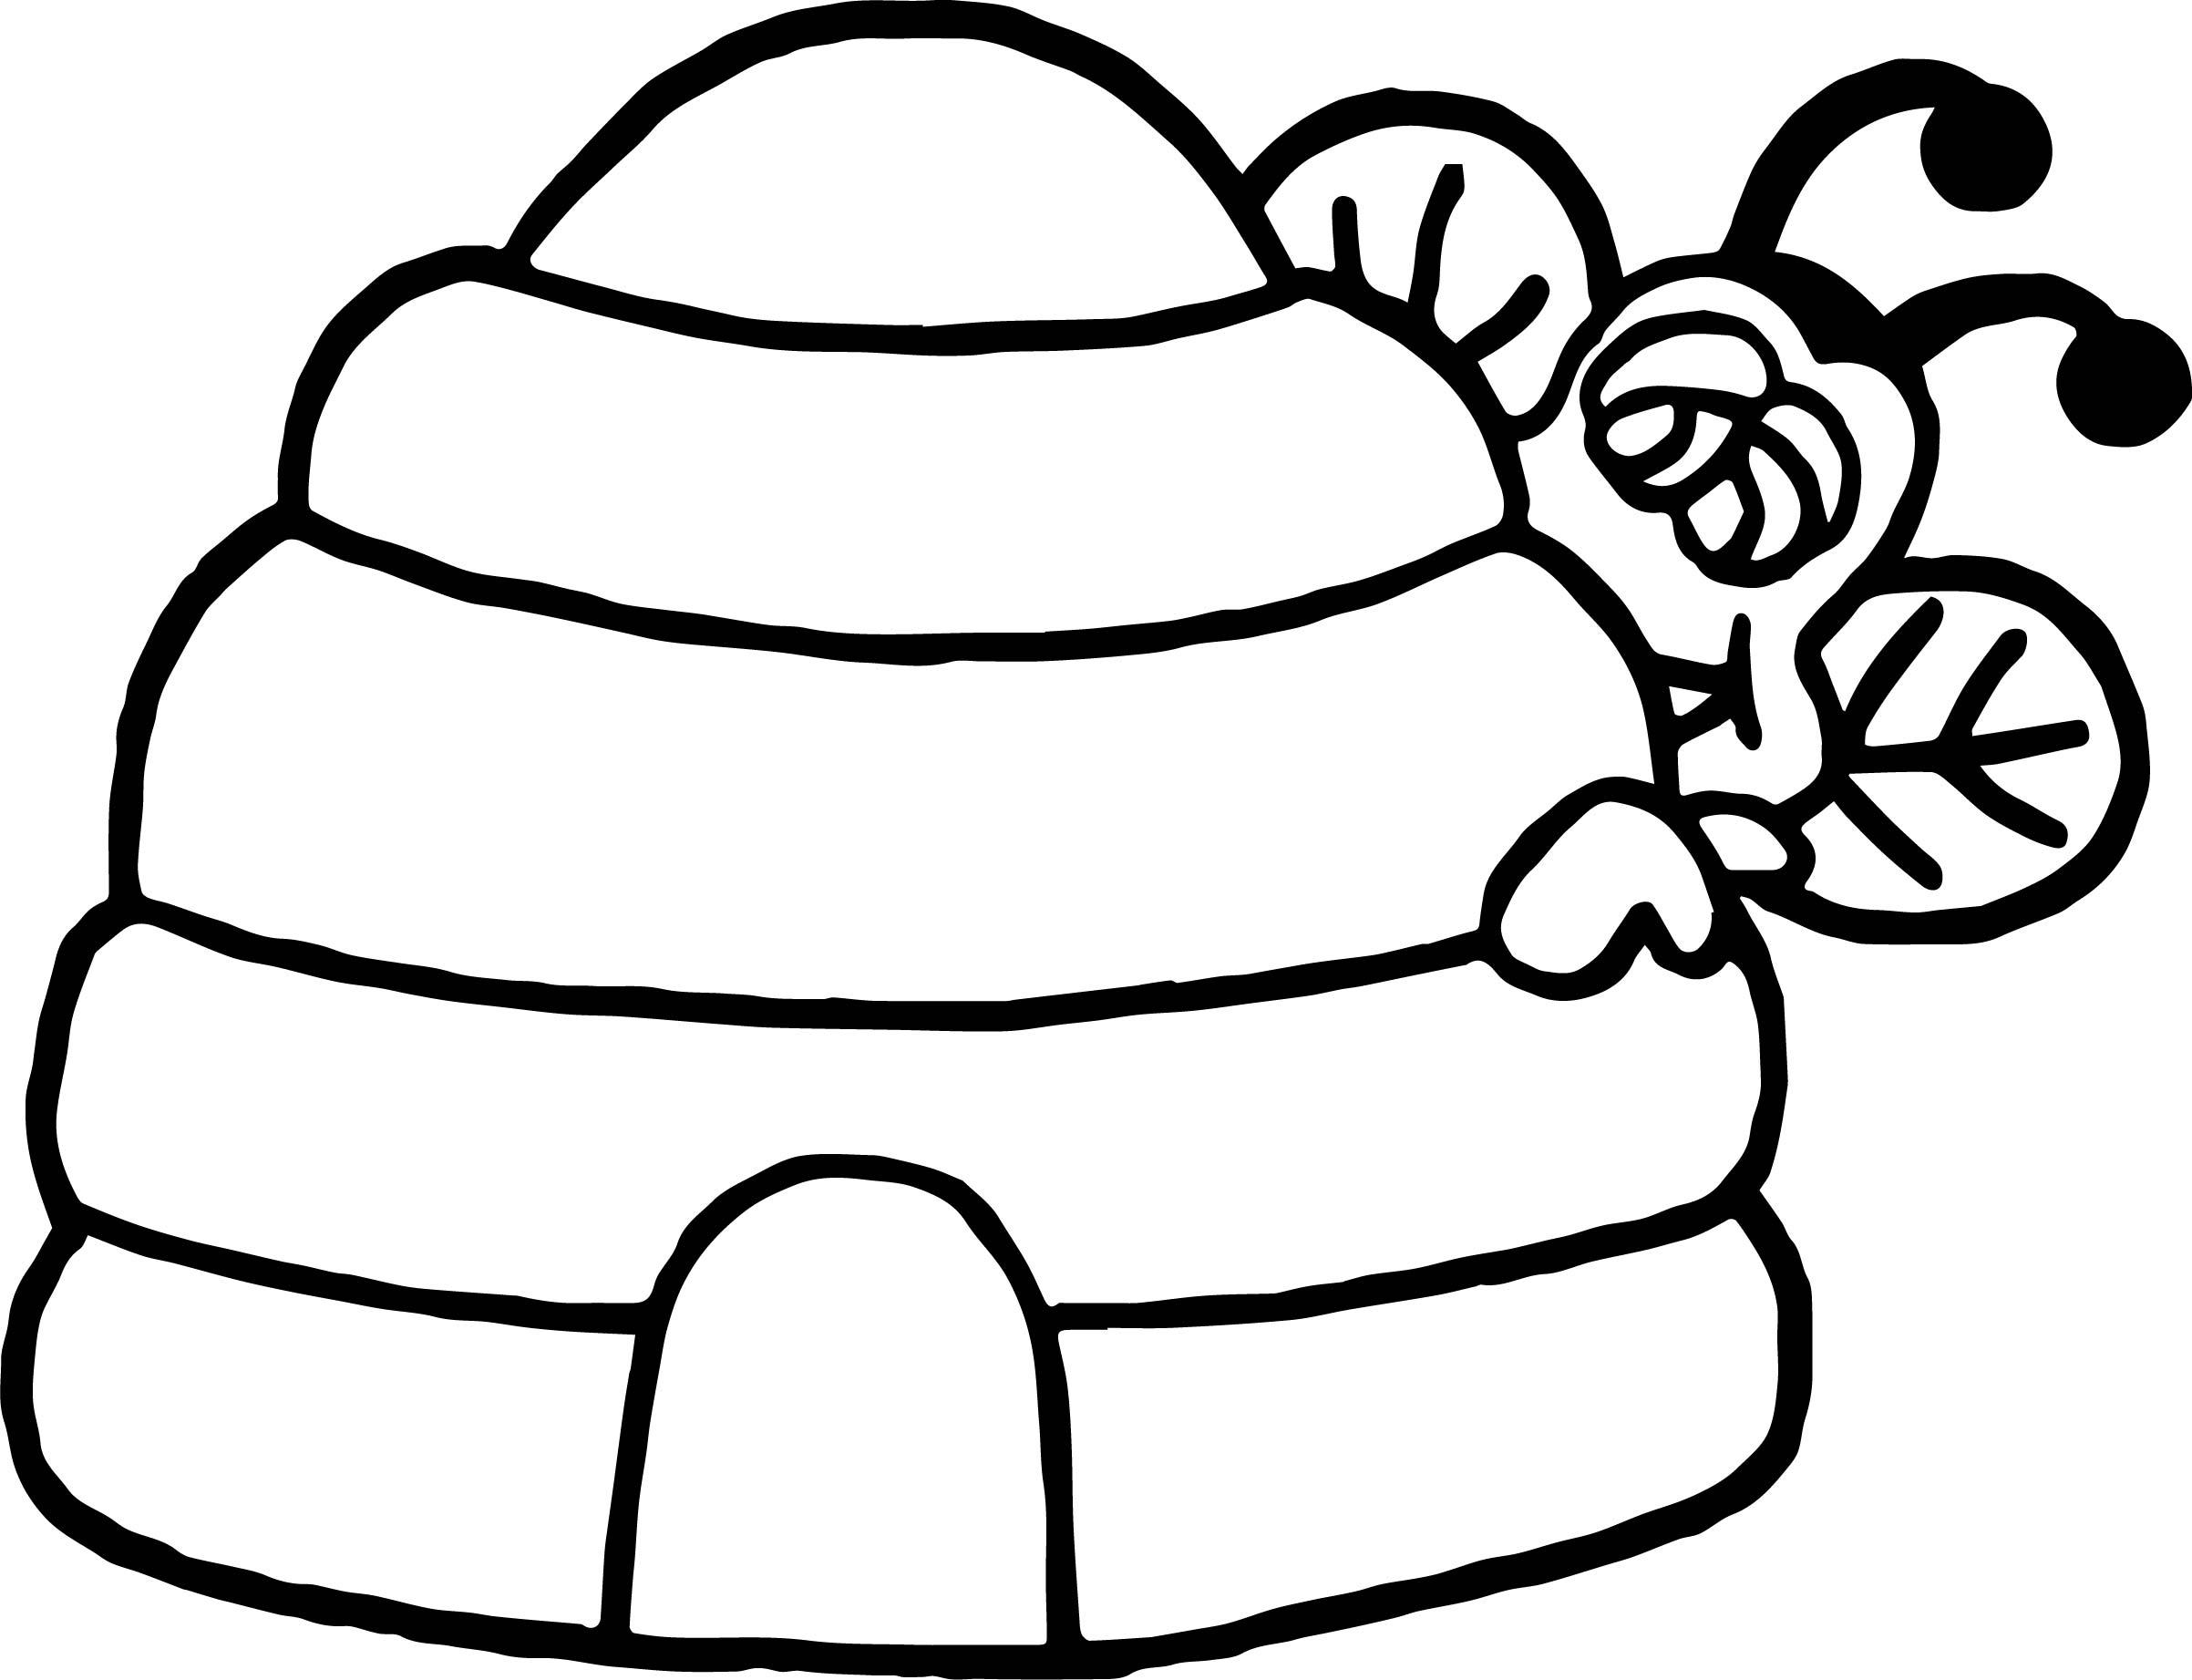 Hide Bee Coloring Page